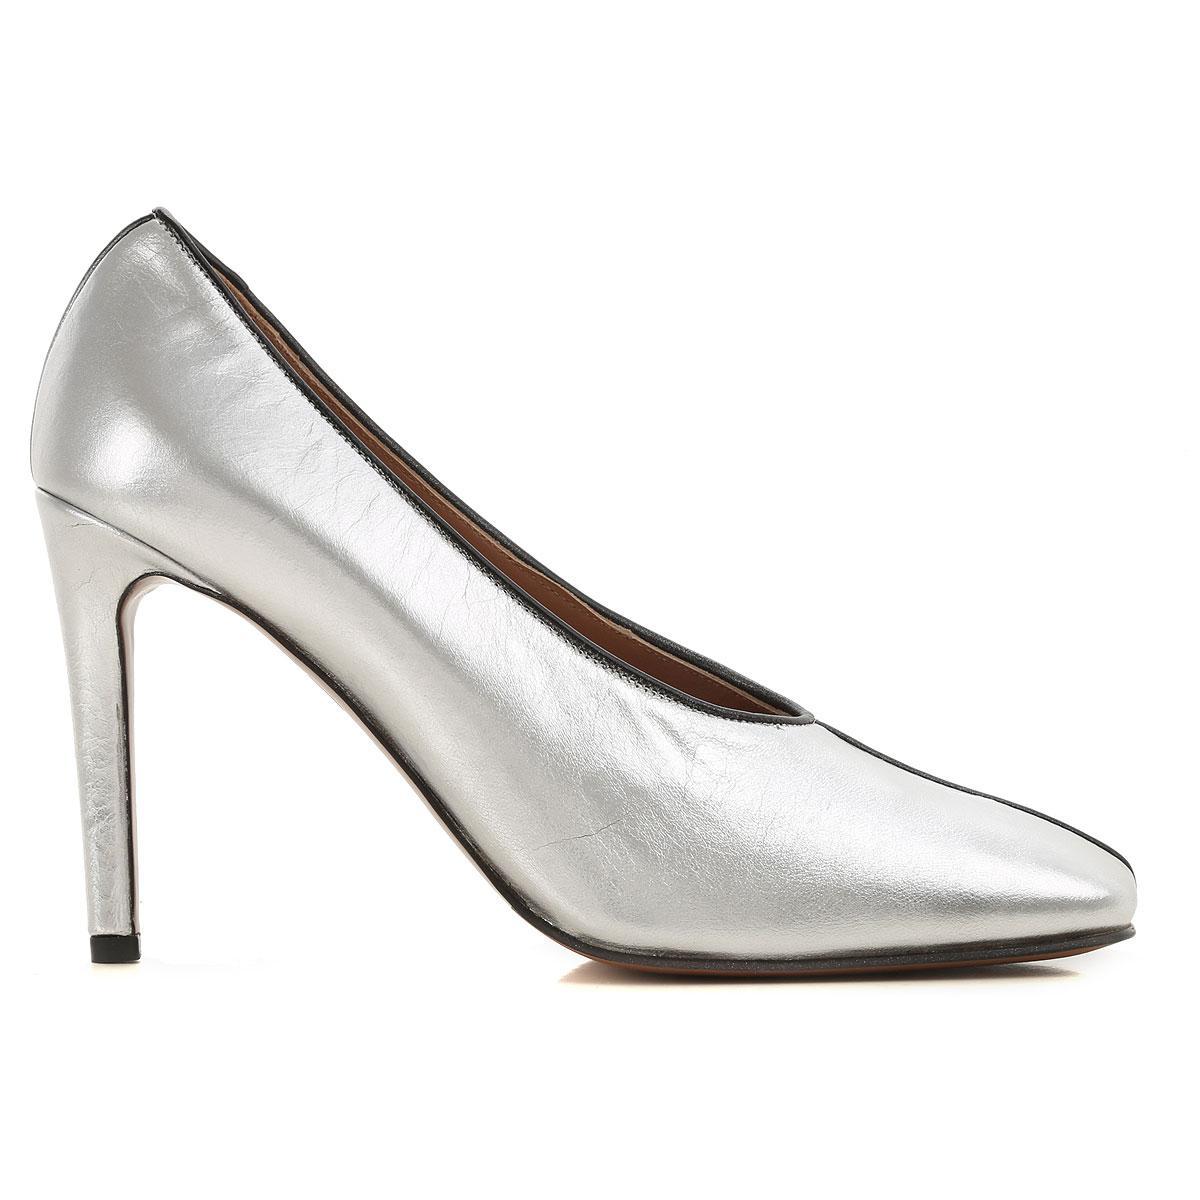 614ad479de8 L Autre Chose - Metallic Pumps   High Heels For Women On Sale - Lyst. View  fullscreen